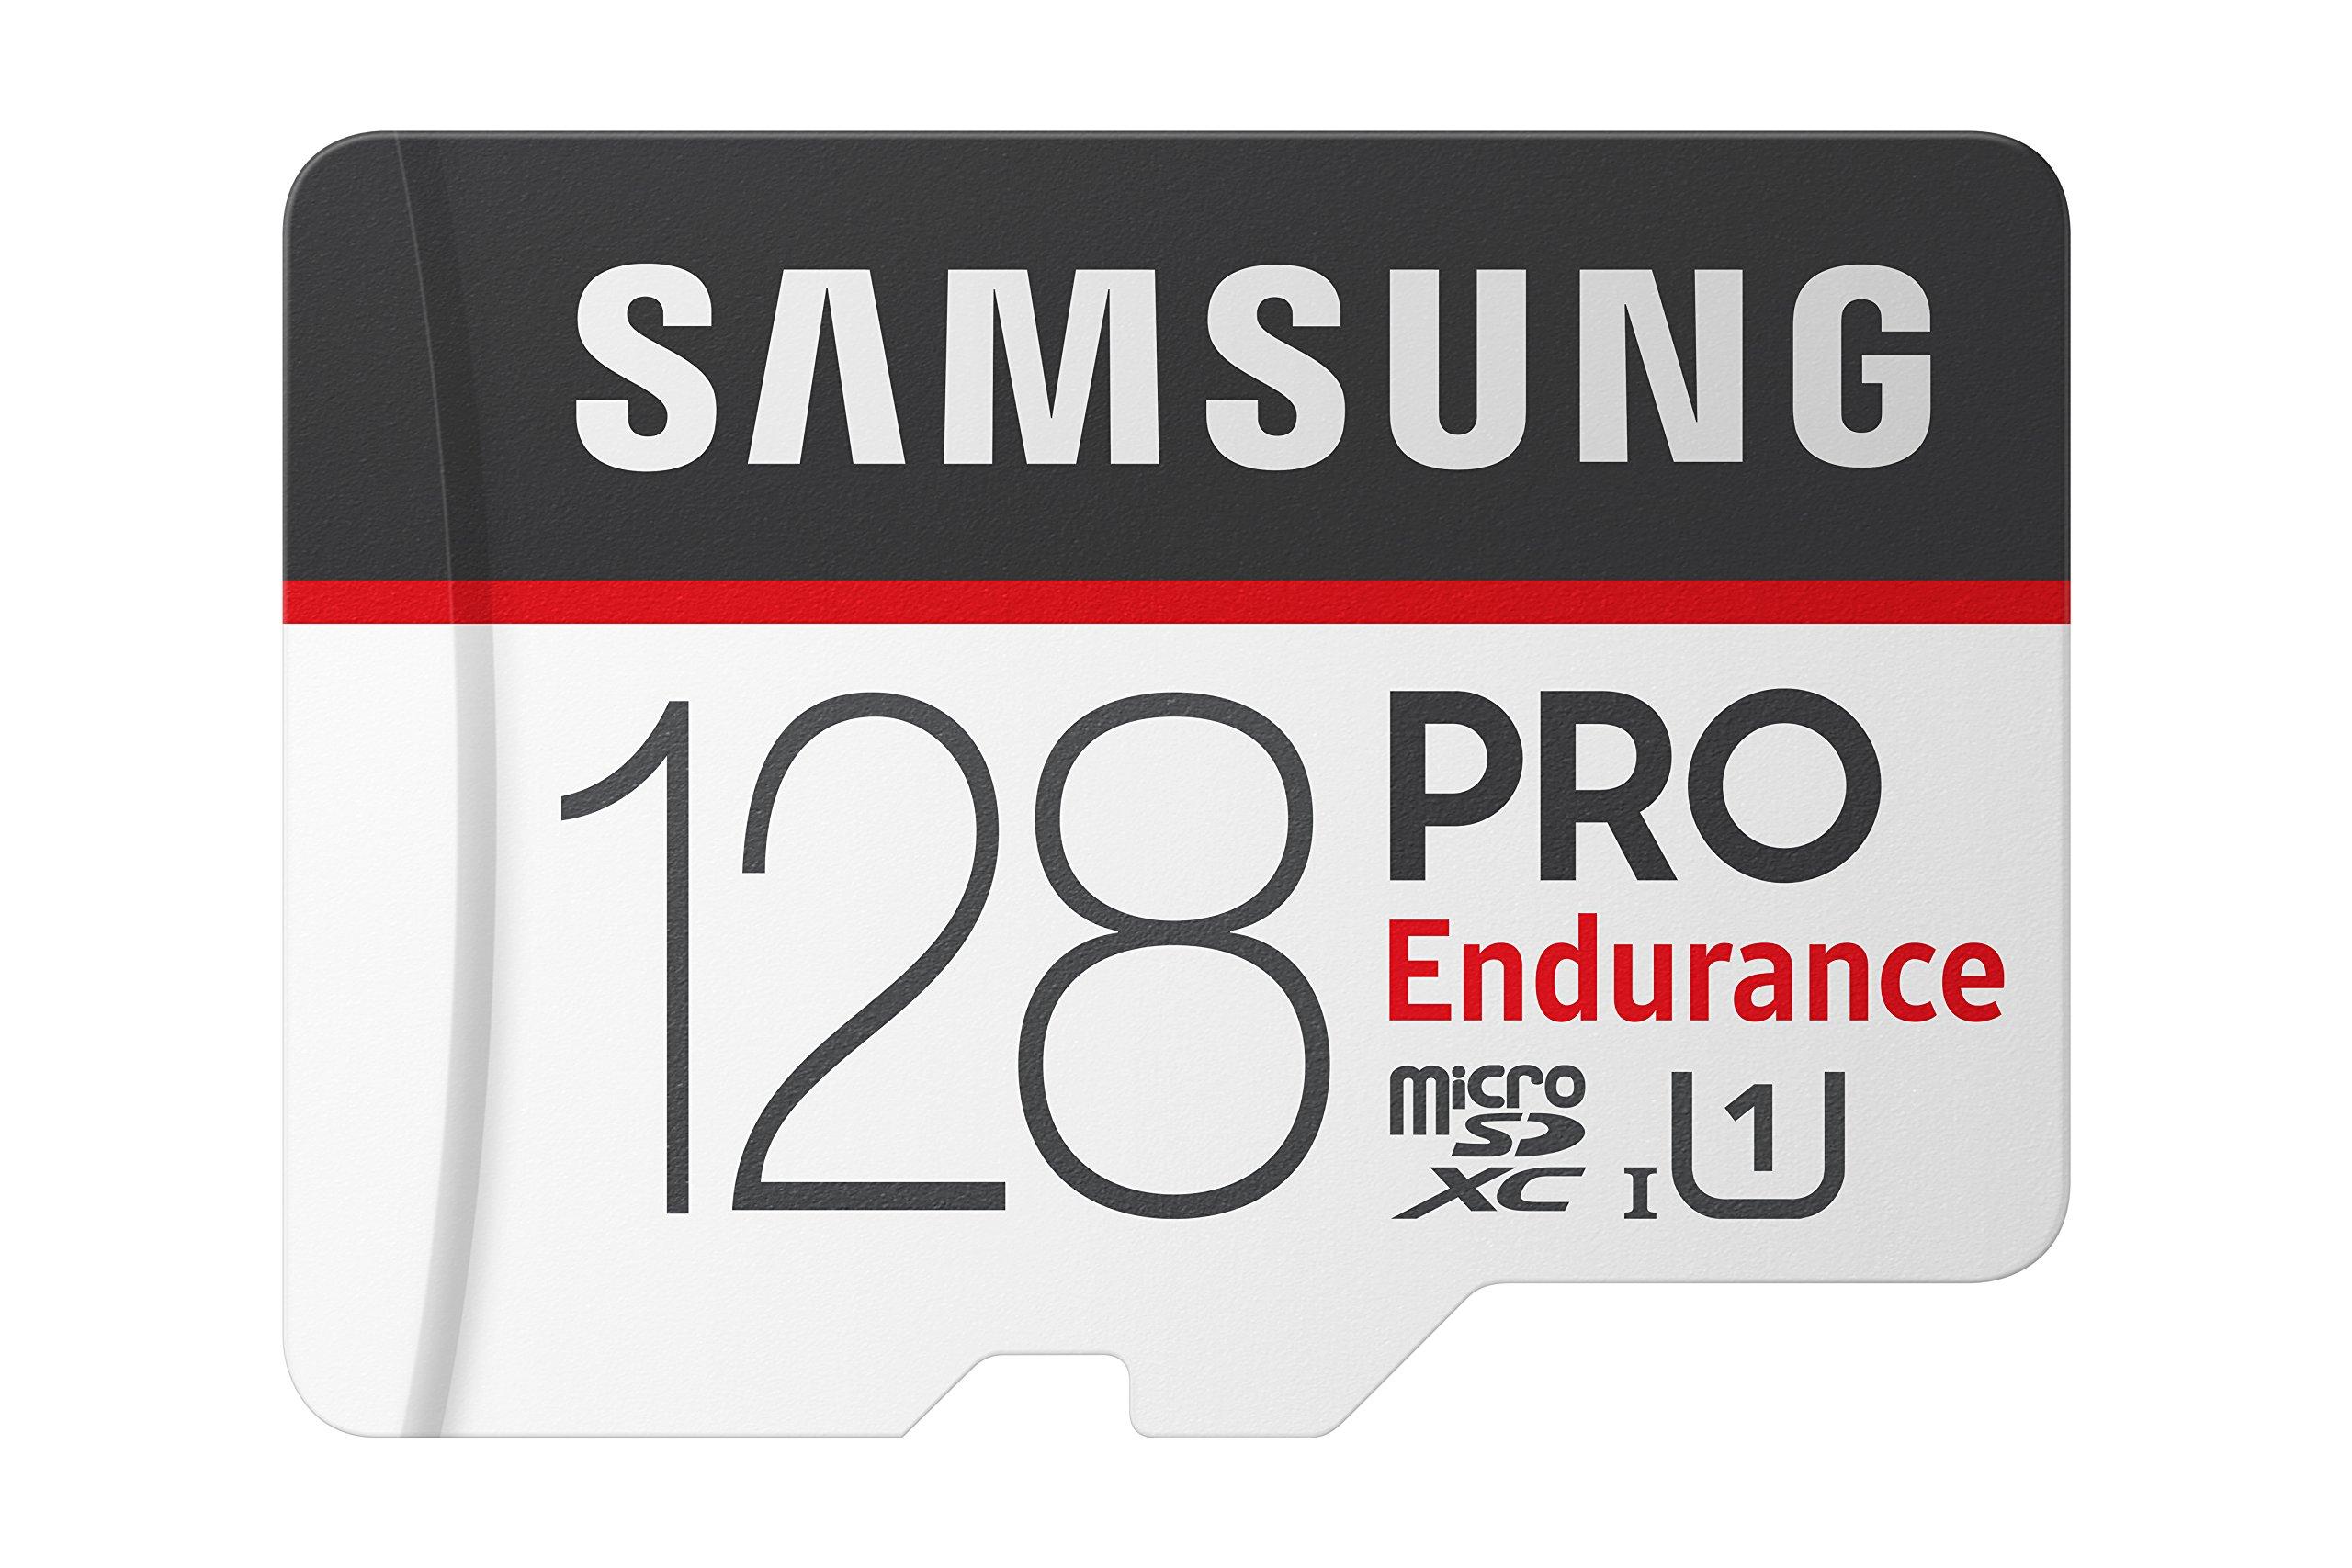 Samsung PRO Endurance 128GB Micro SDXC Card with Adapter - 100MB/s U1 (MB-MJ128GA/AM) by Samsung